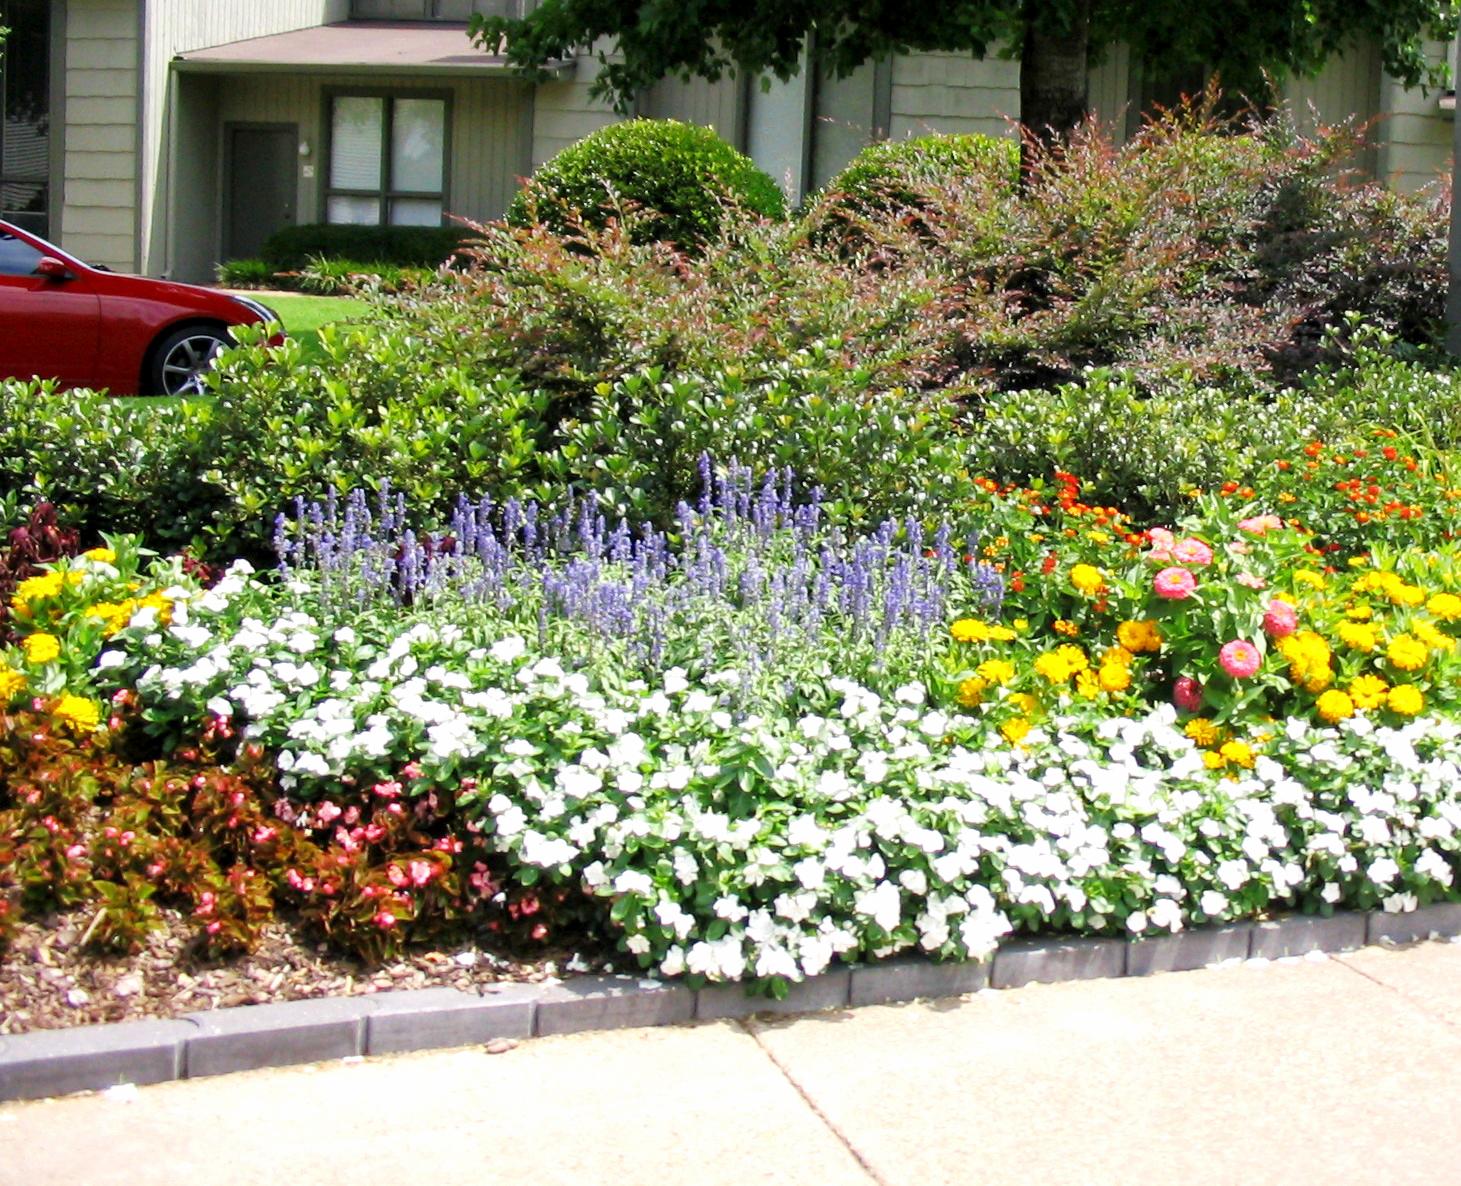 Planting your summer flower garden | Bossier Press-Tribune